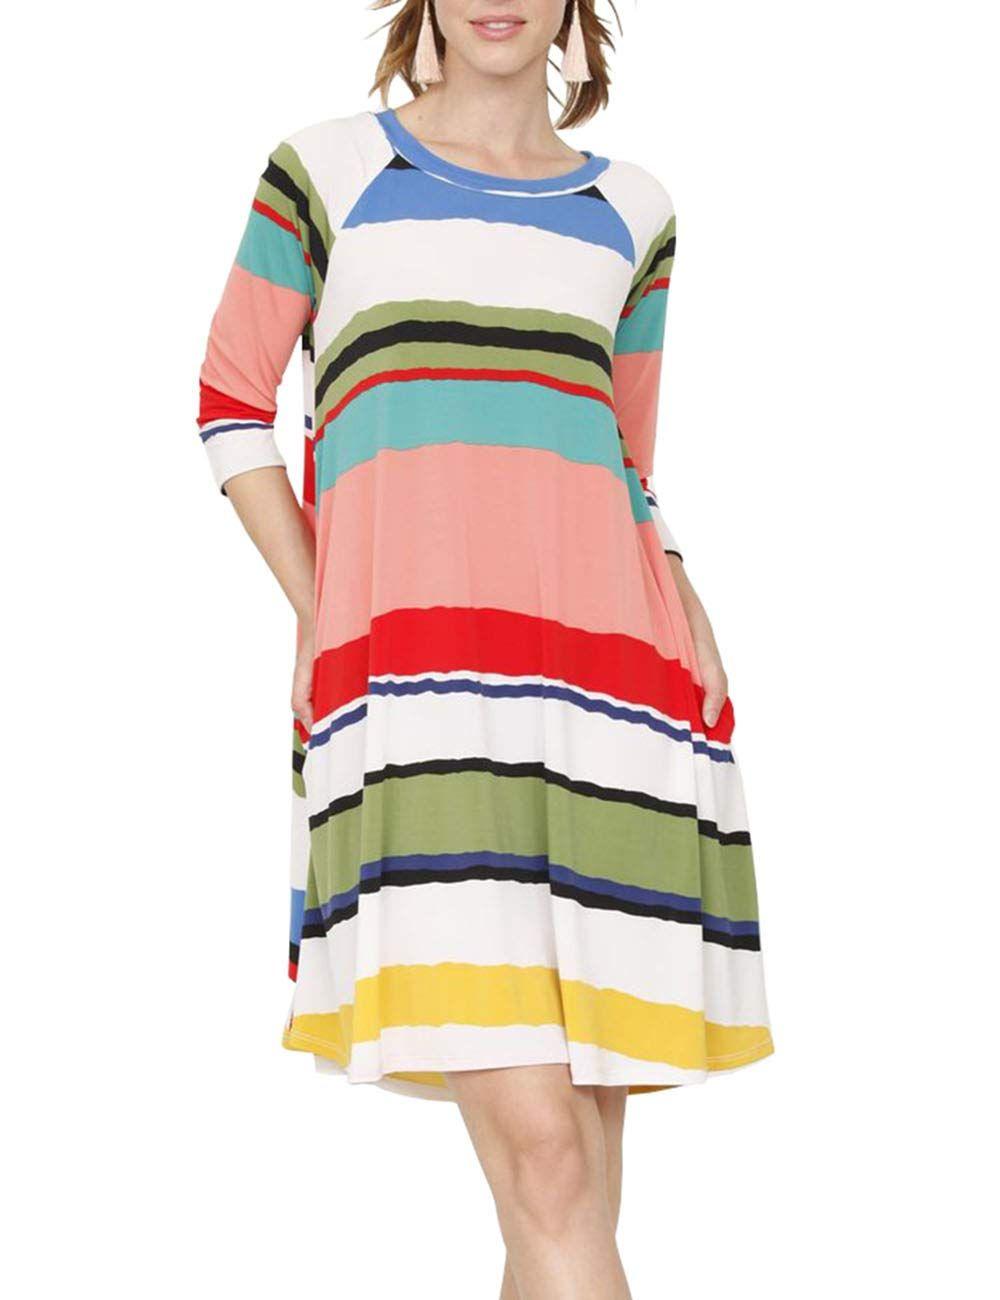 cb60faf84e5 DUNEA Womens 3 4 Sleeve Striped Print Midi Dress with Pockets Color Block  Raglan Tunic